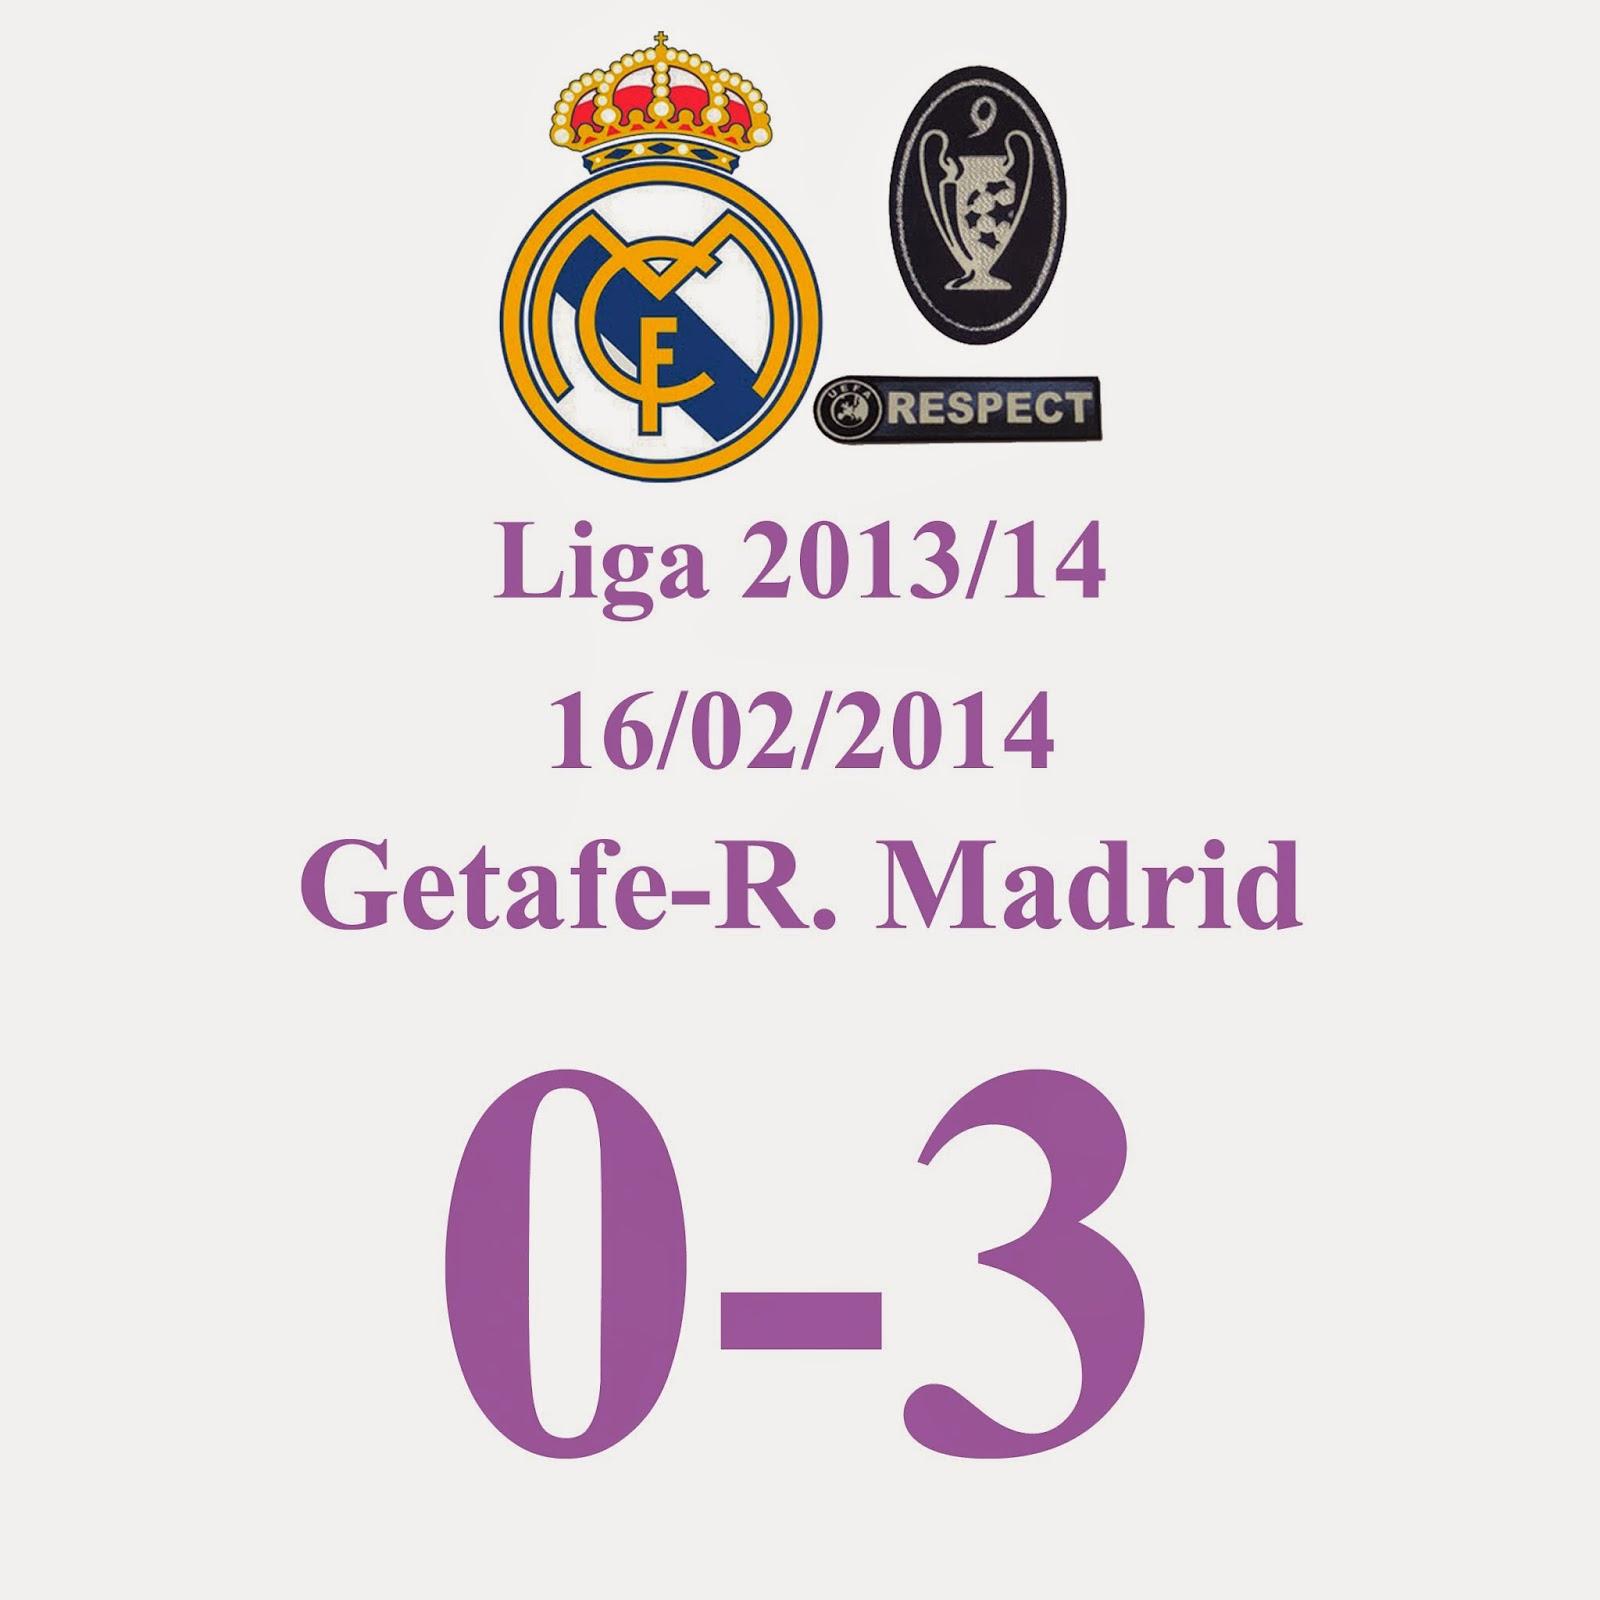 Getafe 0 - 3 Real Madrid (Jornada 24) 16/02/2014 - Goleada del Real Madrid en Getafe